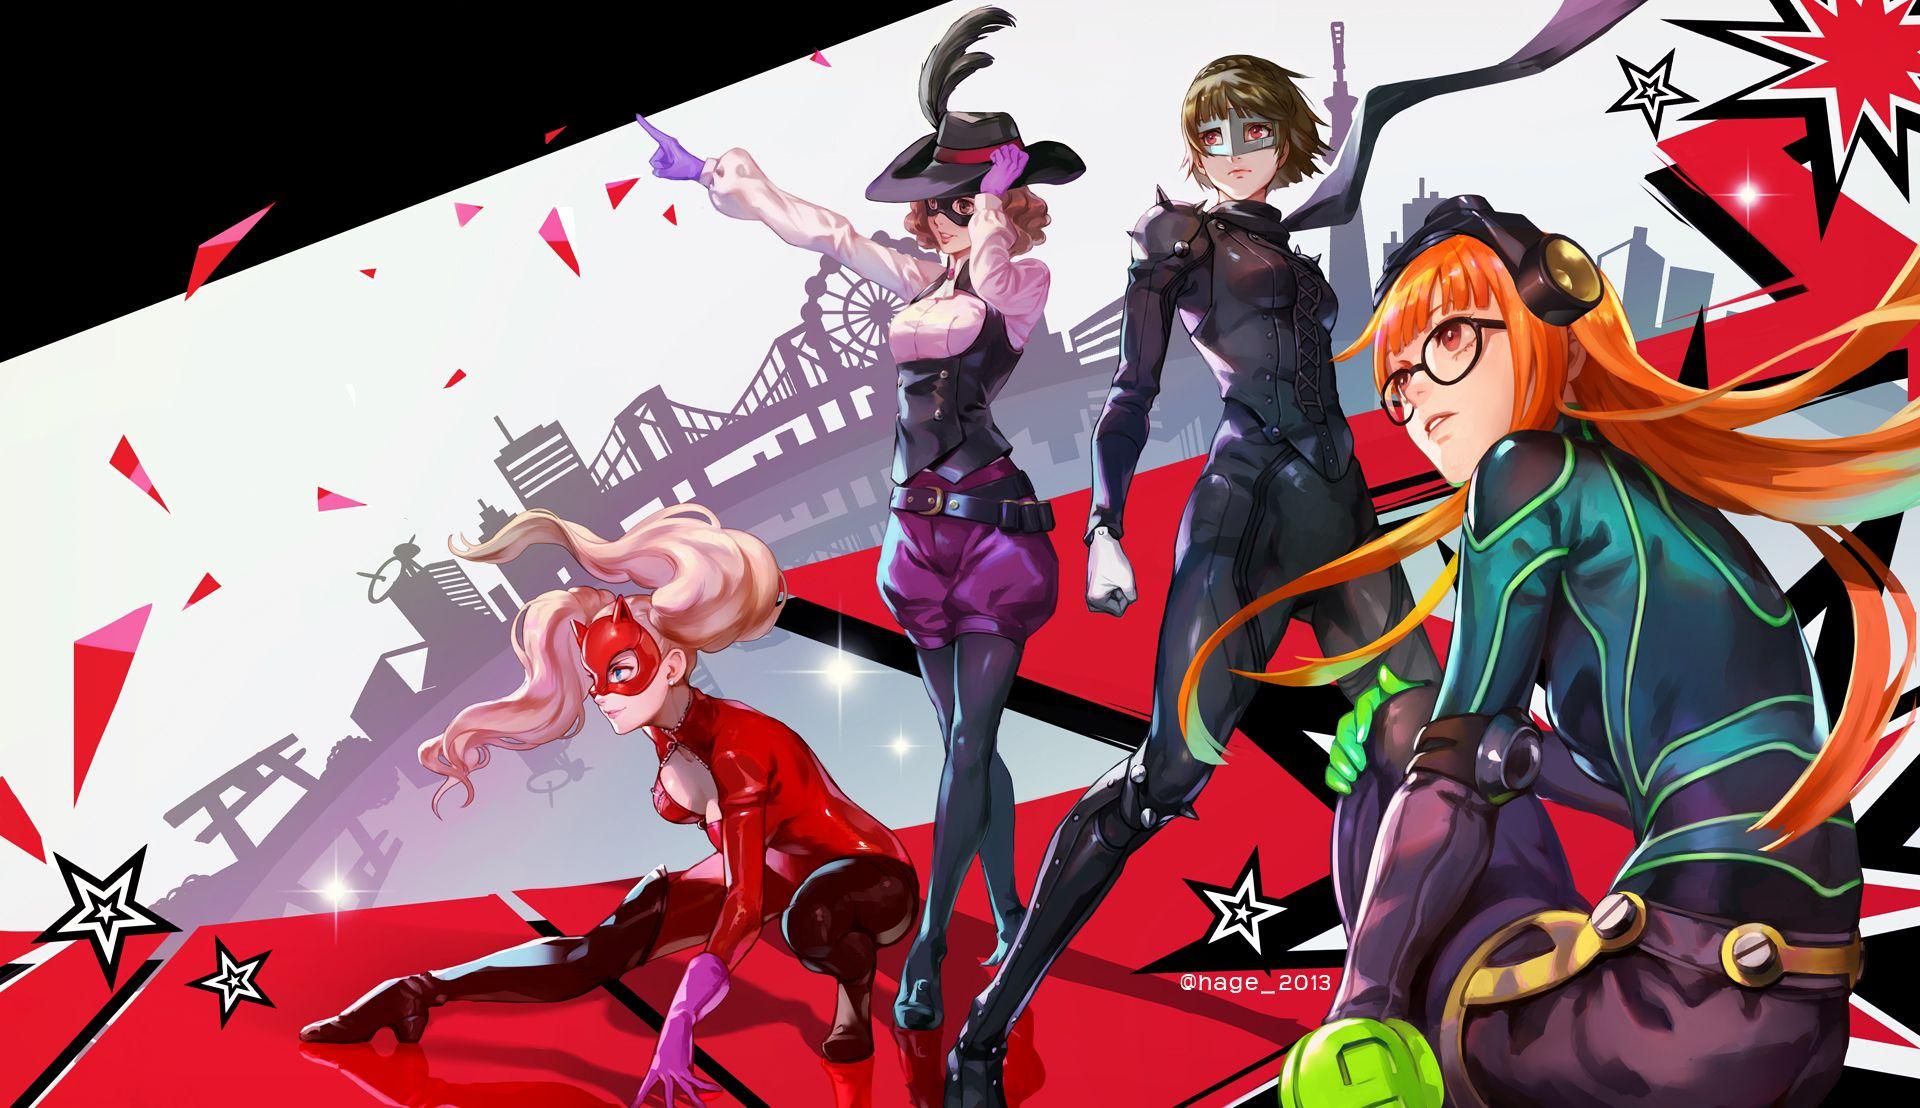 Persona 5 Wallpaper 1080p Persona 5 Persona Persona 5 Ann